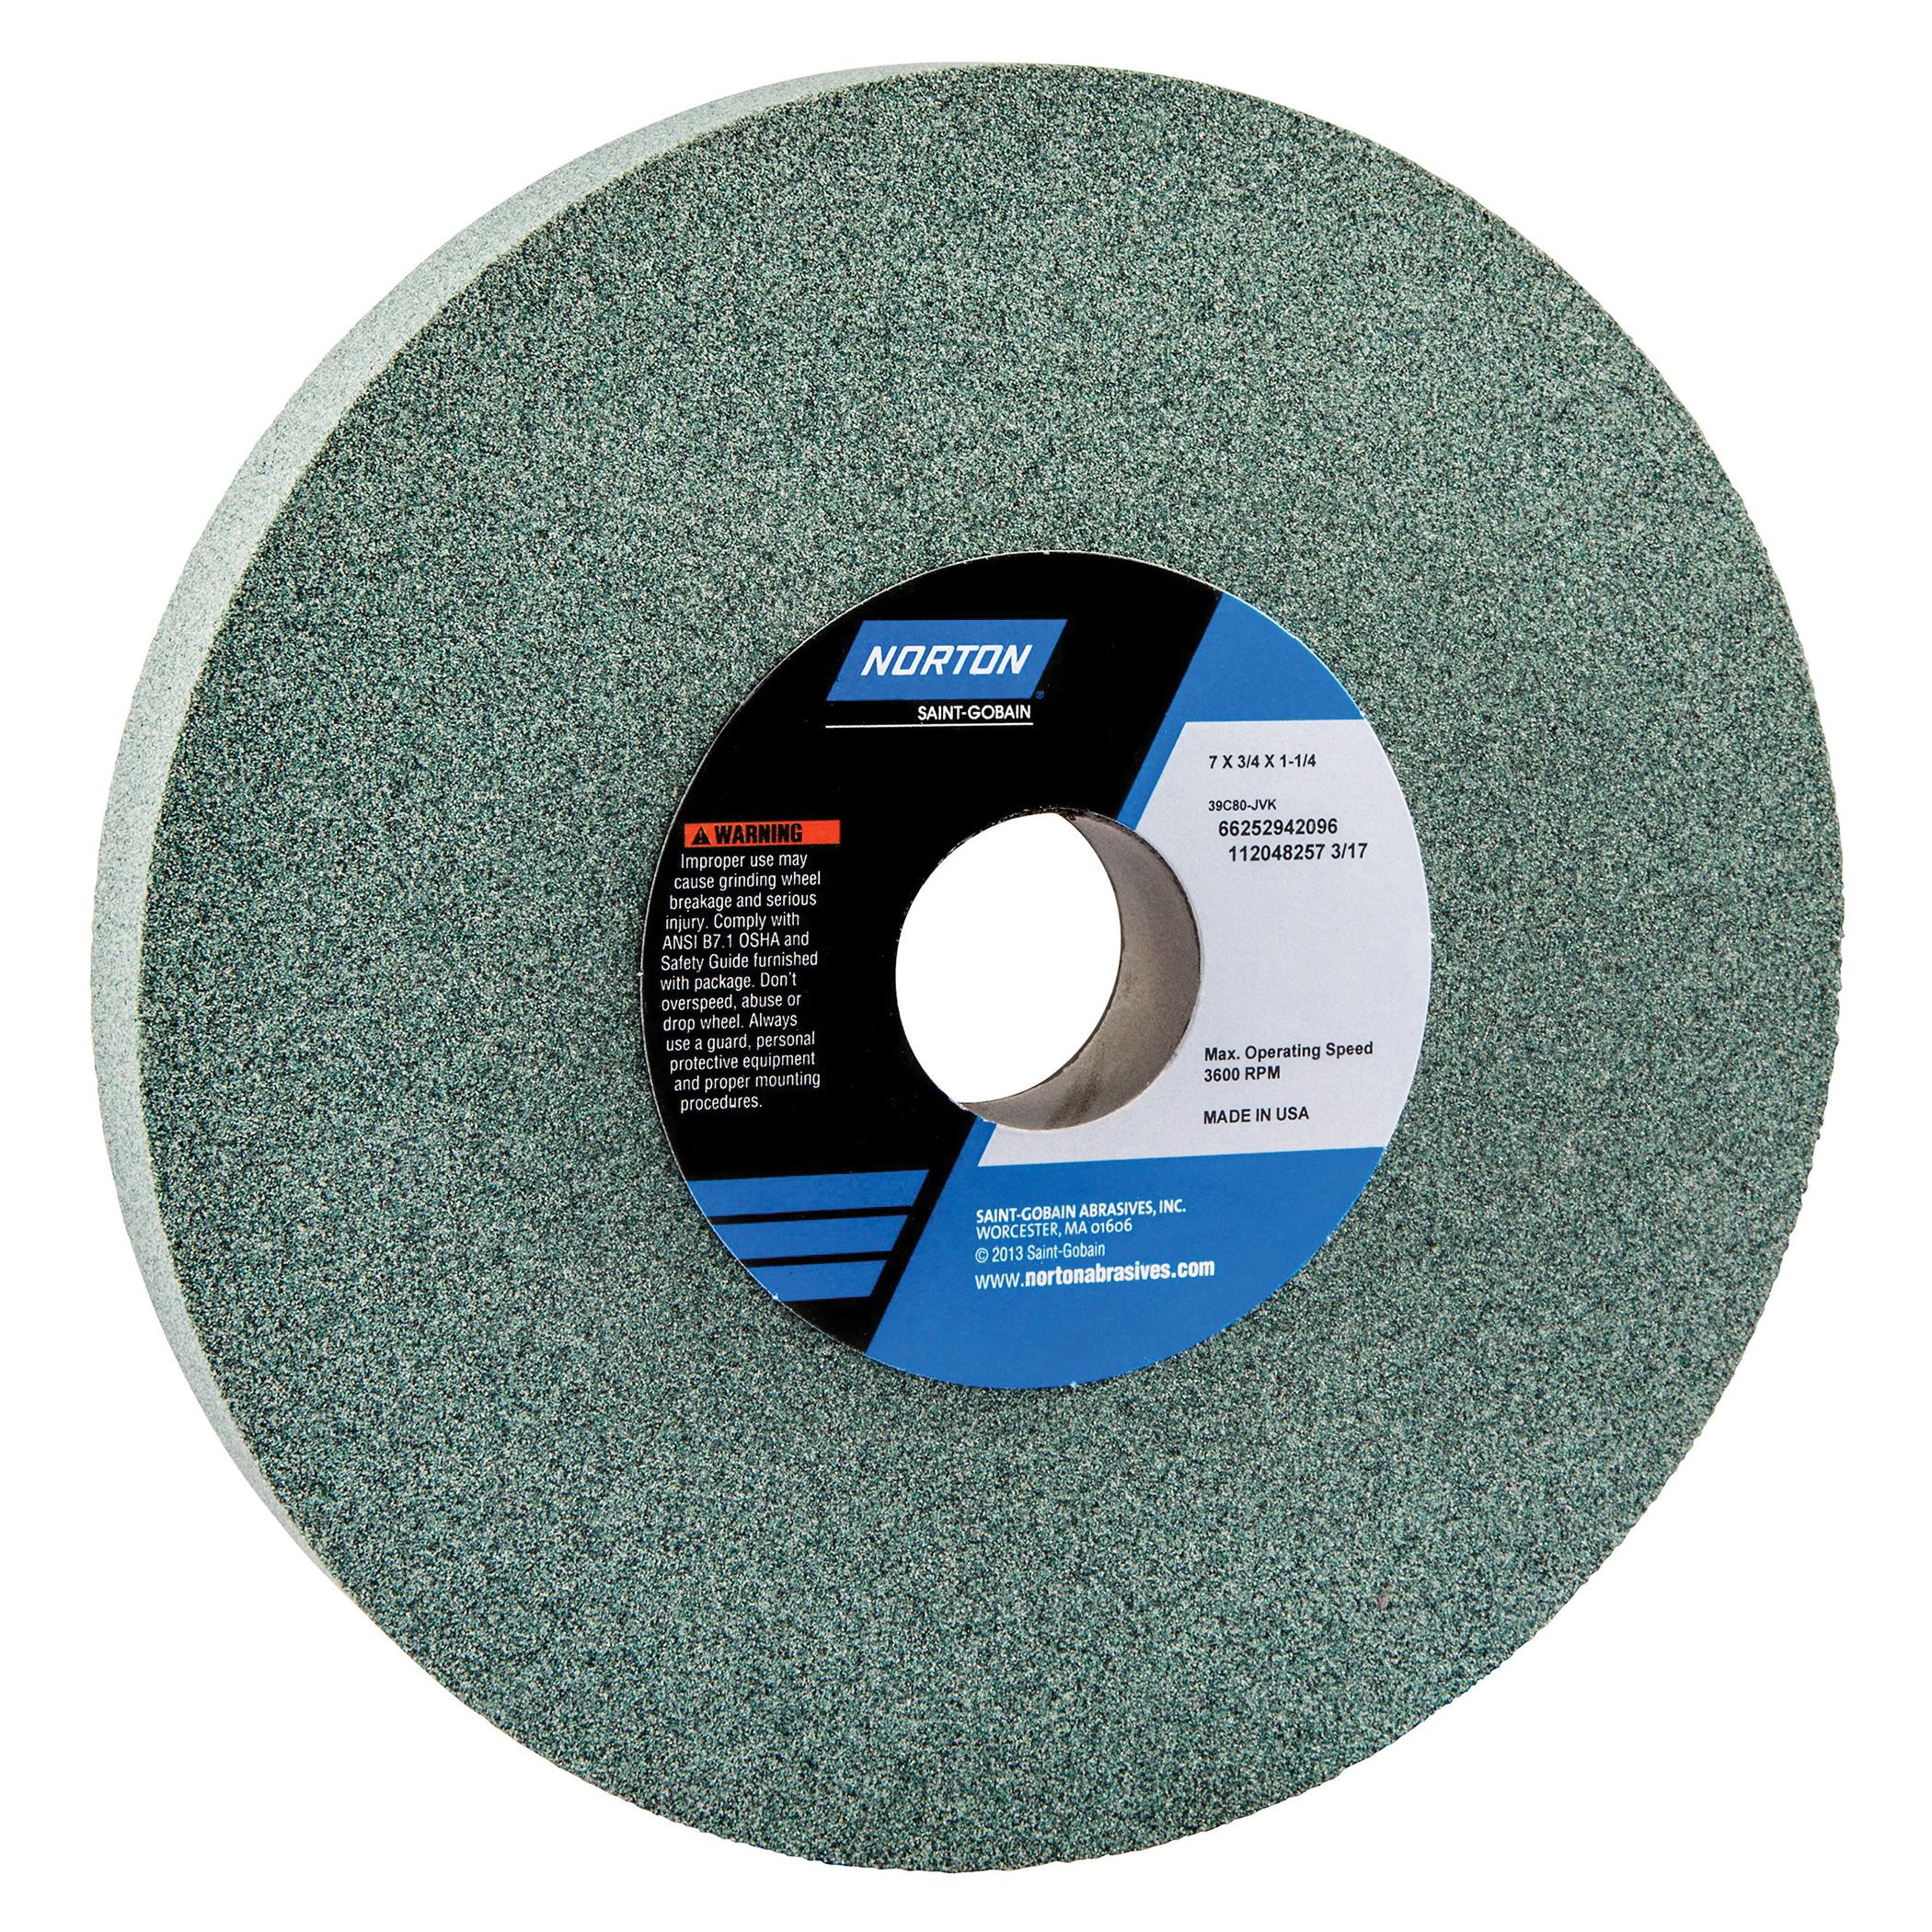 Norton® 66252942096 39C Straight Toolroom Wheel, 7 in Dia x 3/4 in THK, 1-1/4 in Center Hole, 80 Grit, Silicon Carbide Abrasive